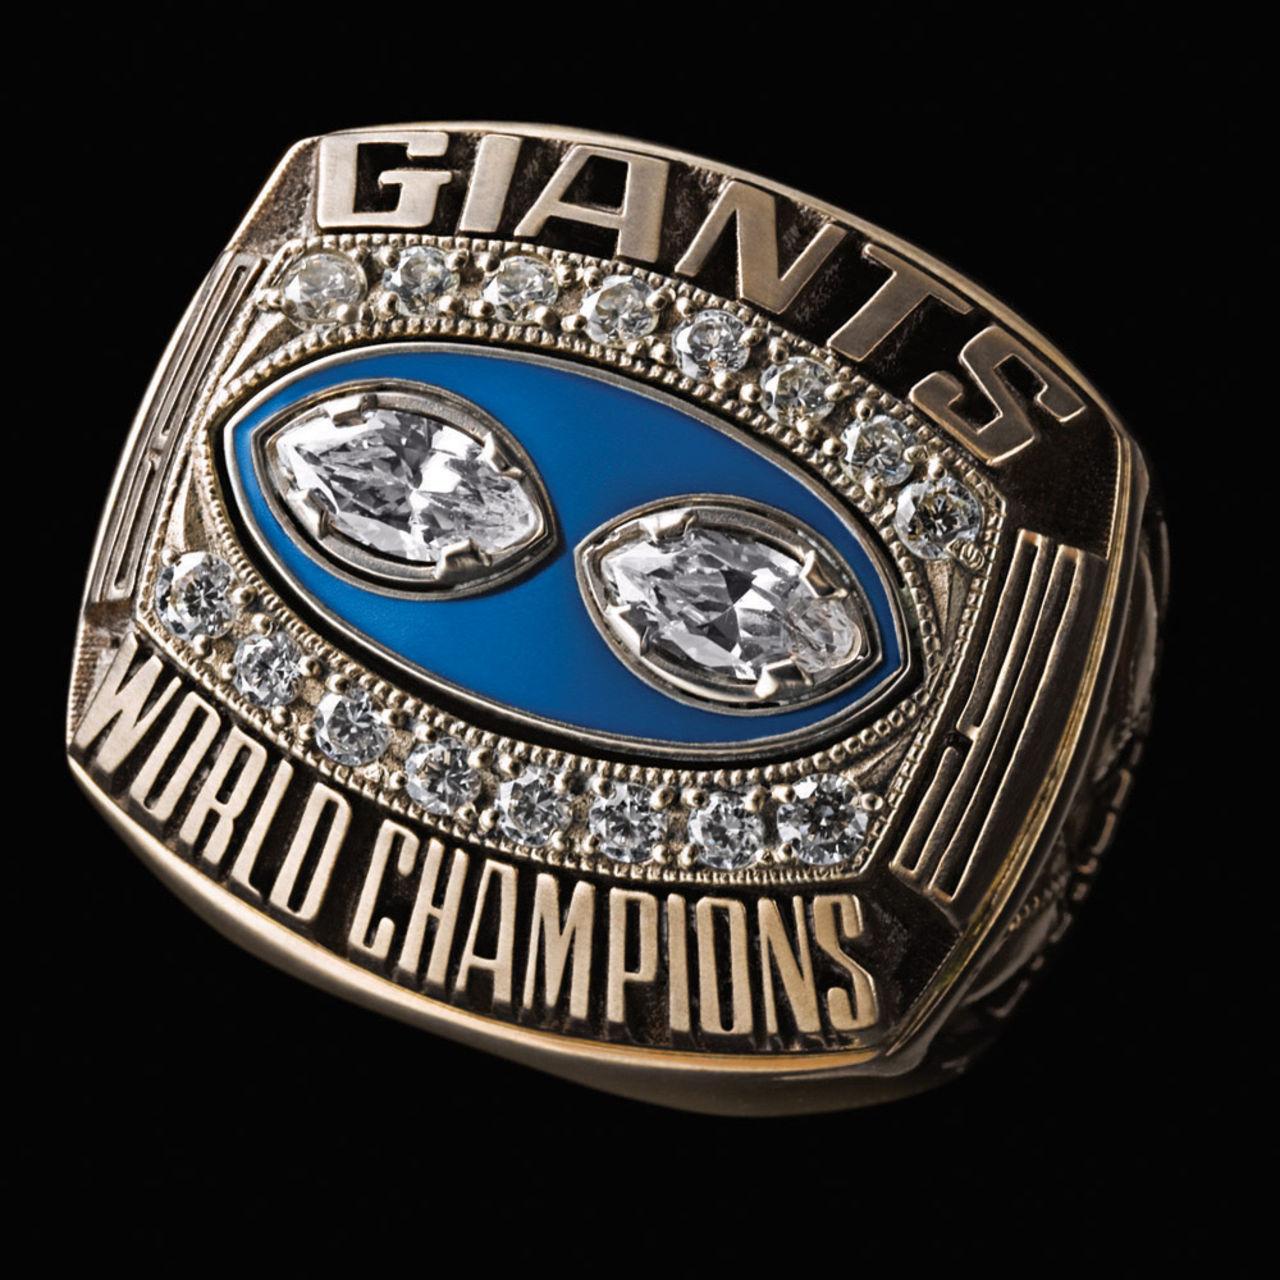 New York Giants 1991 champions ring